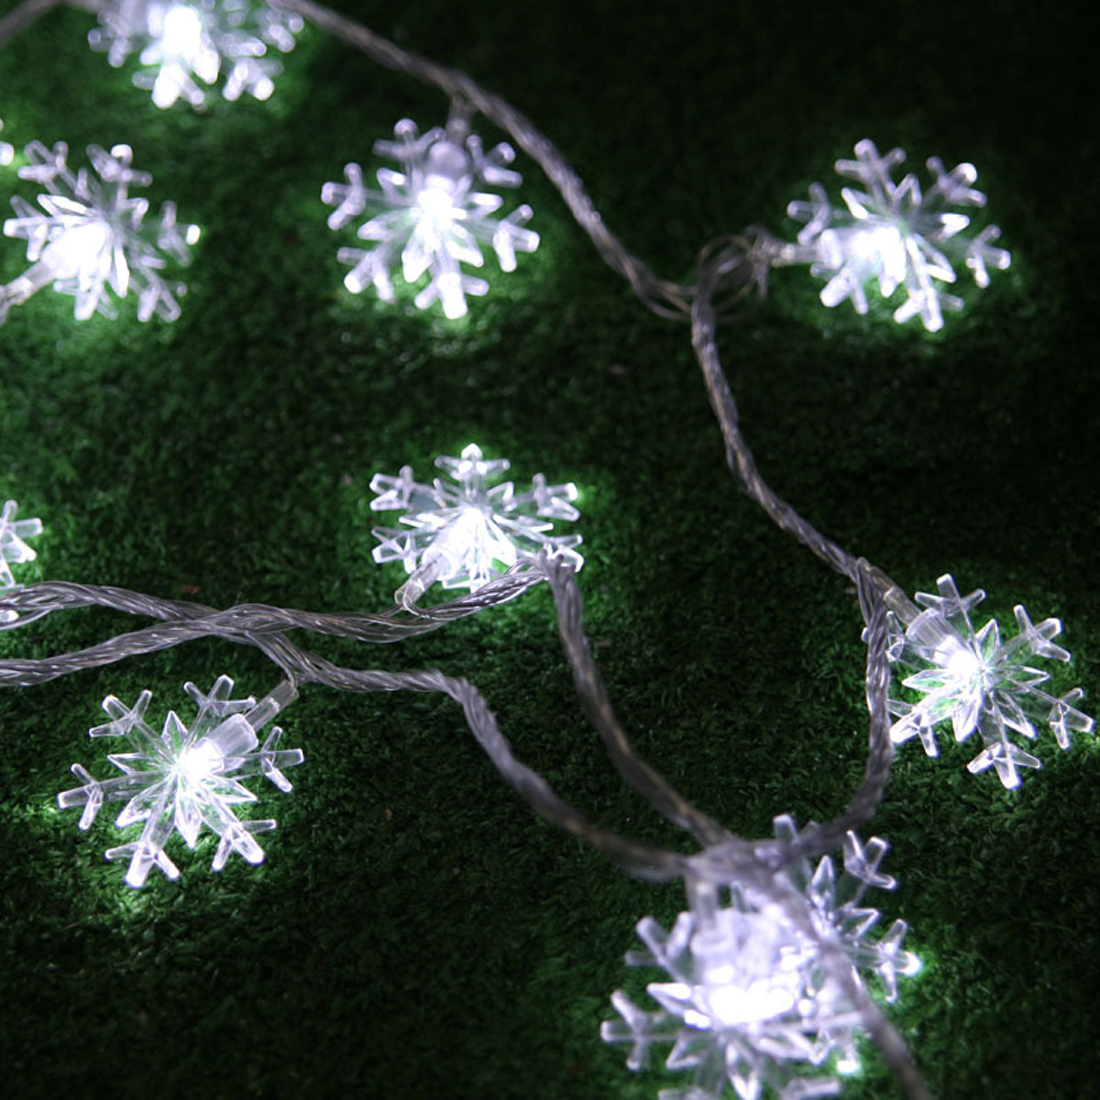 New Lights Outdoor 10m 100LED String Lights Garden Light for Home Wedding Party Decoration EU Plug